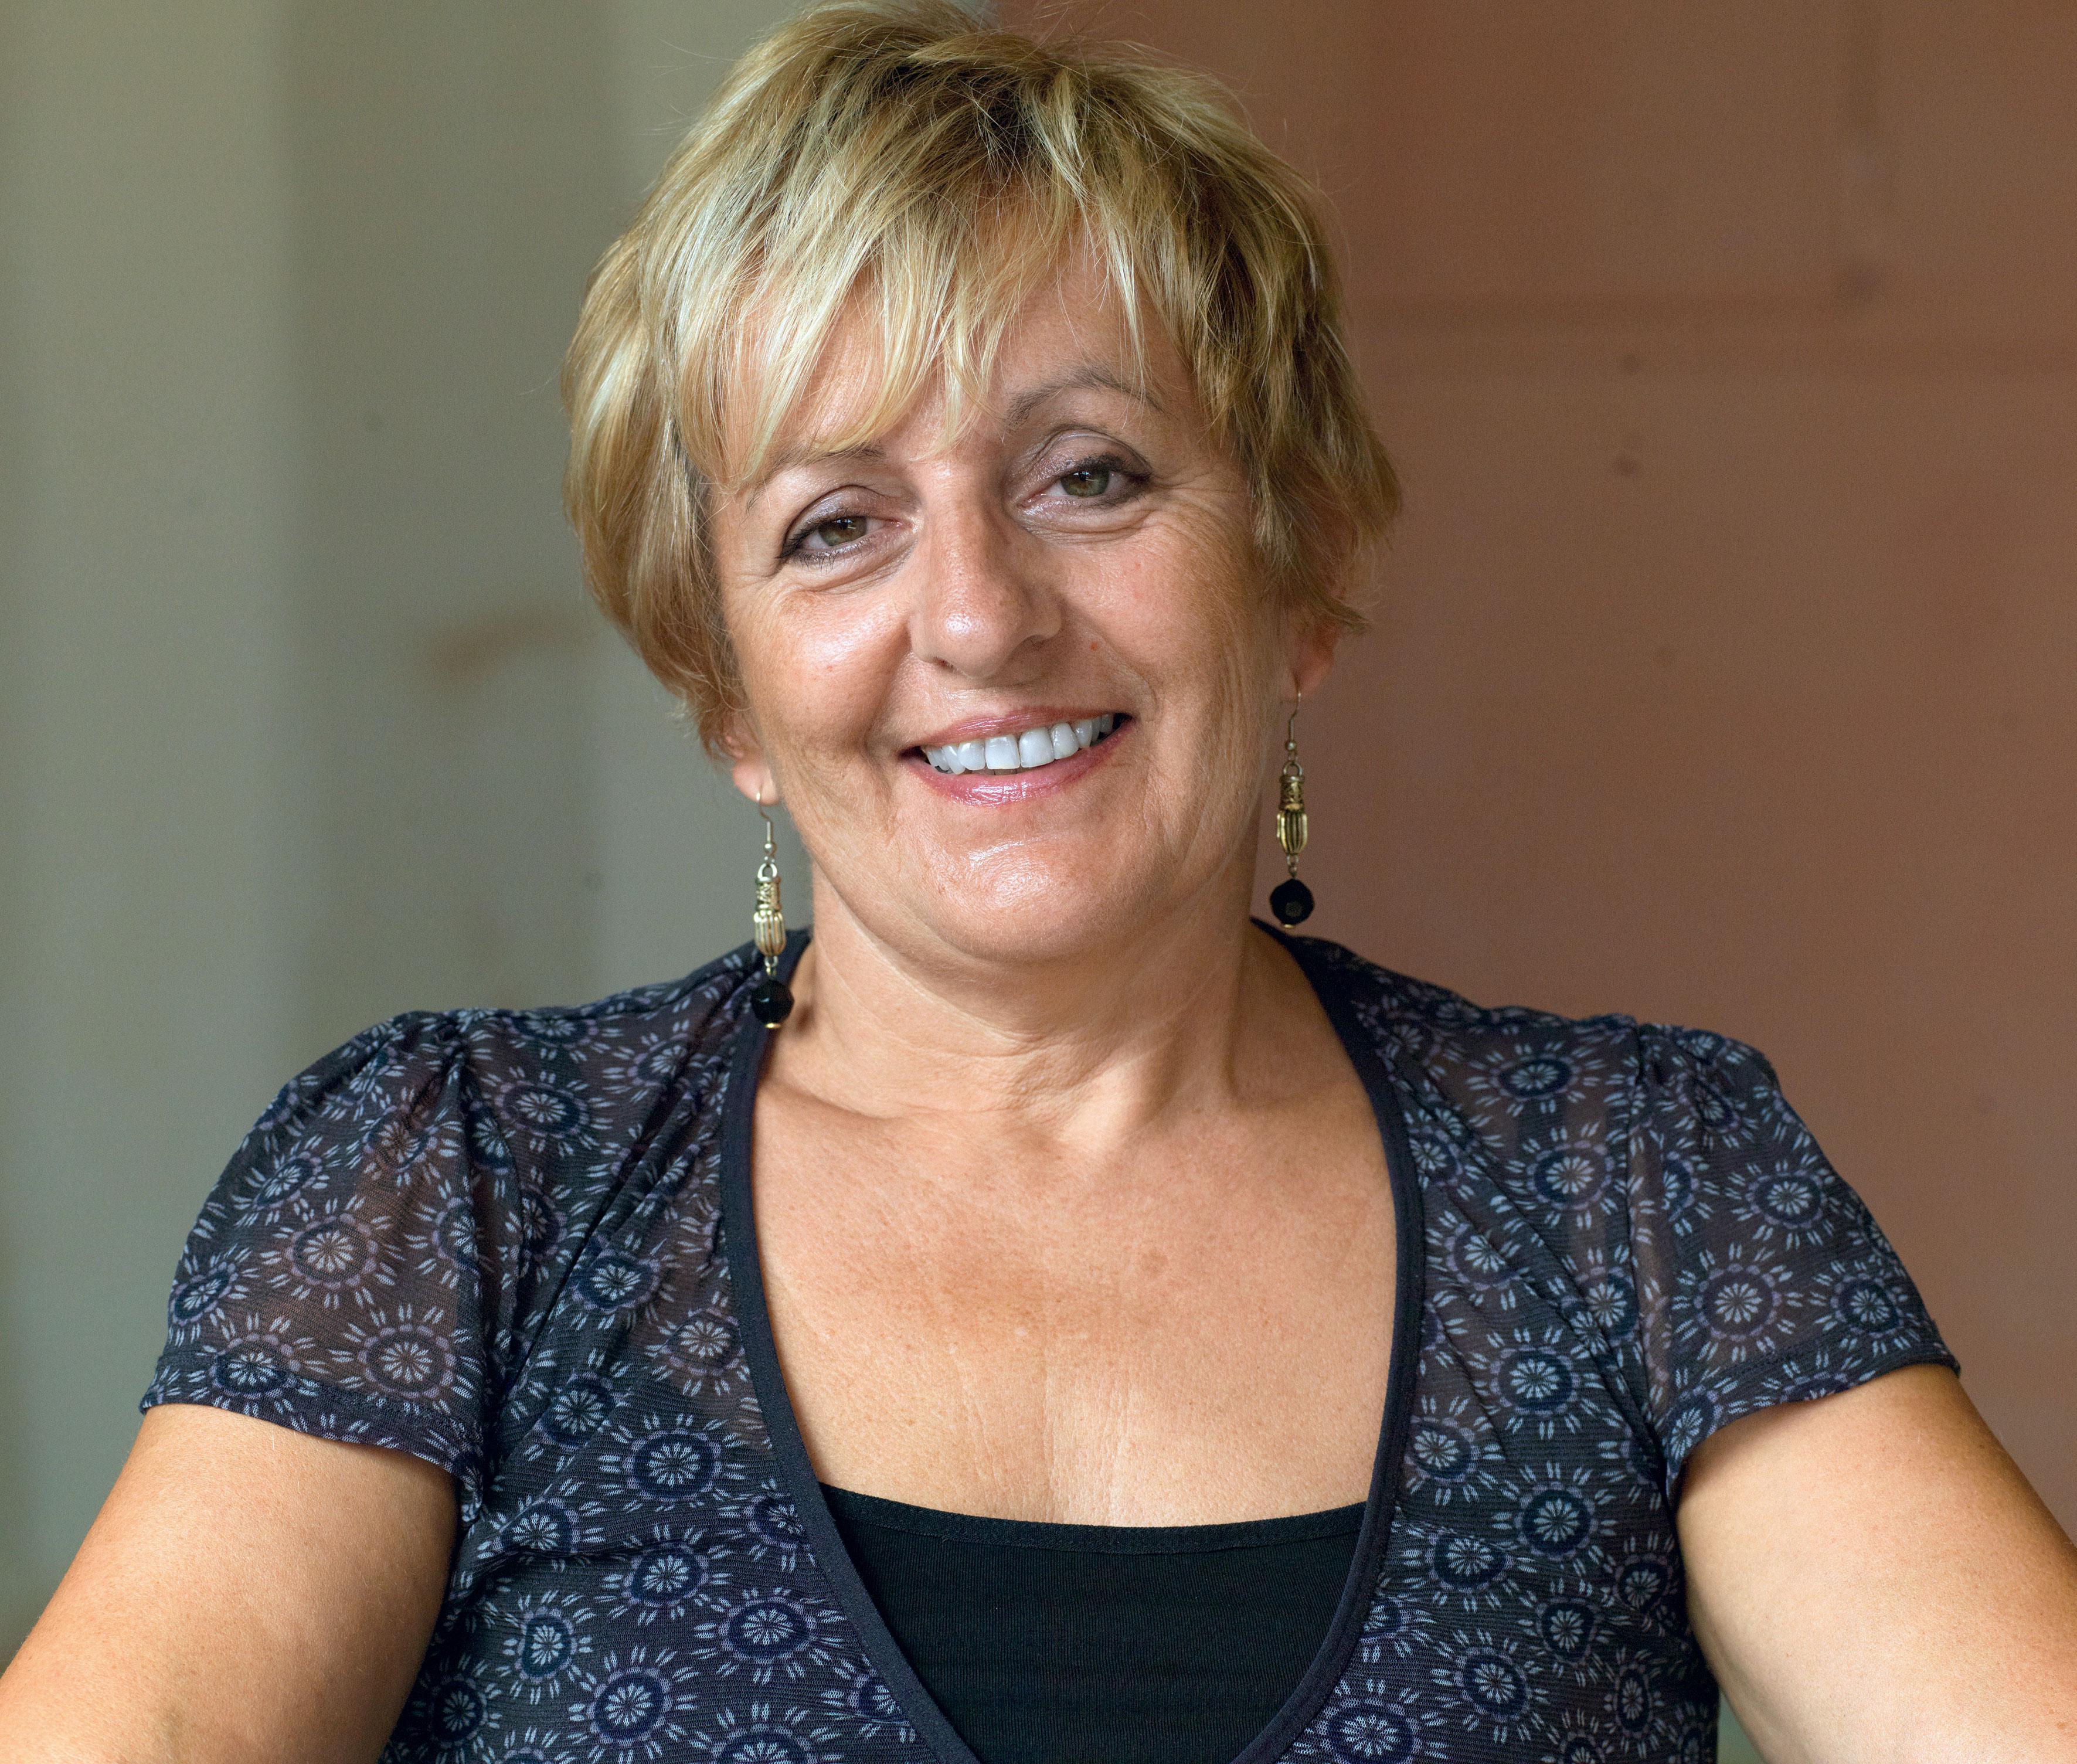 Catherine Keirsebilk